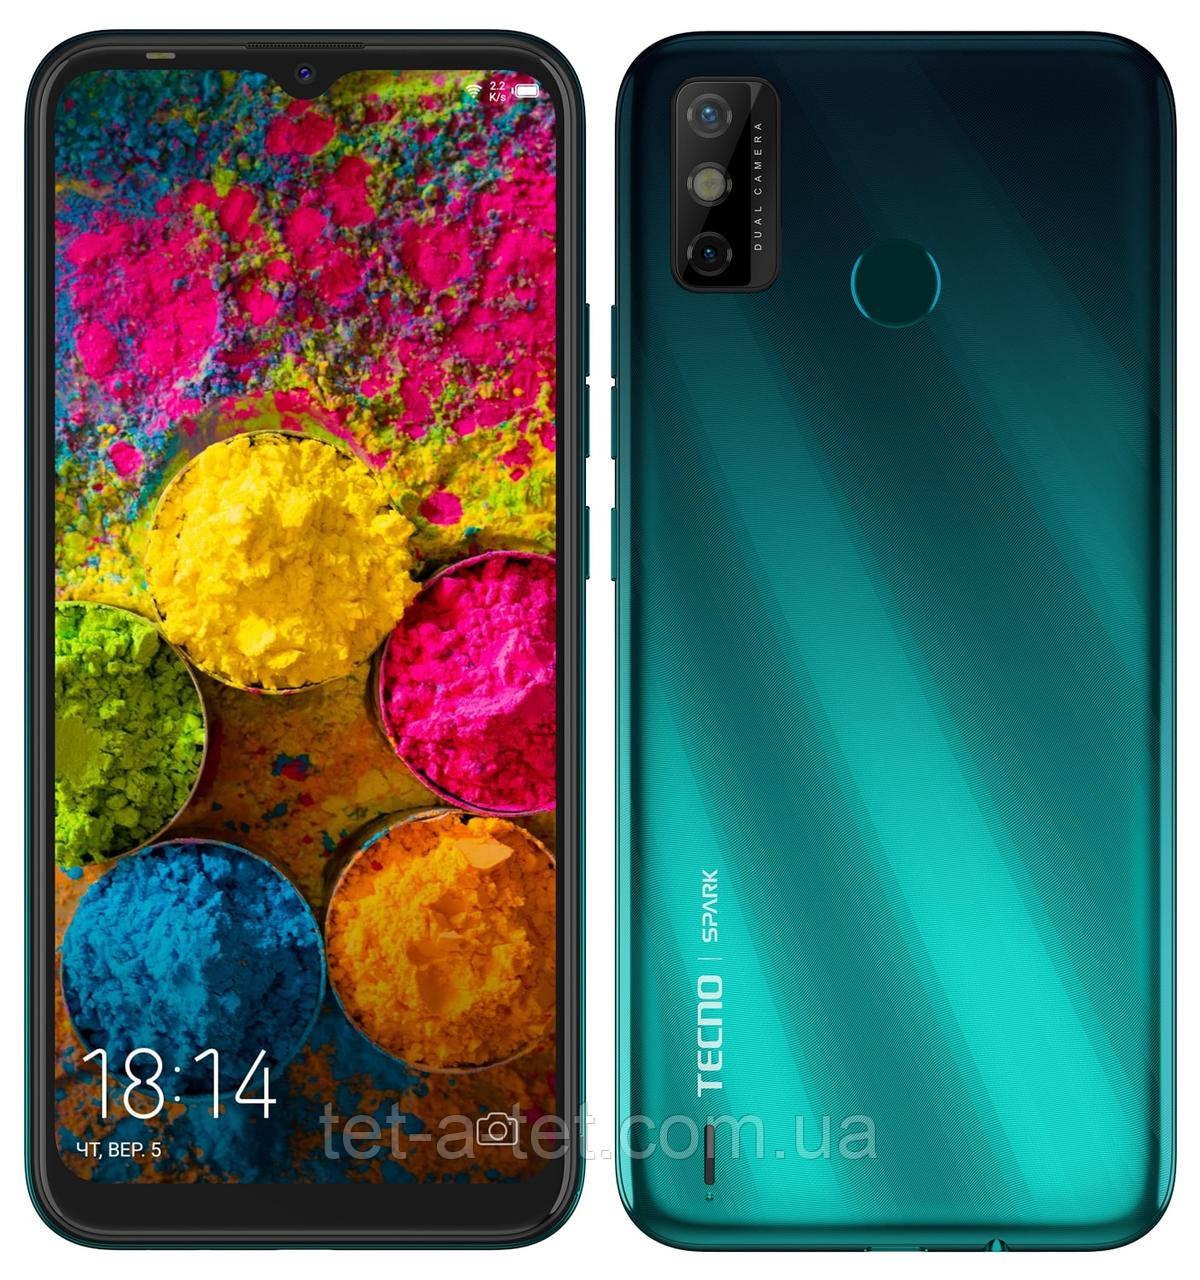 Смартфон TECNO Spark 6 Go (KE5) 2/32GB Ice Jadeite (UA UCRF)